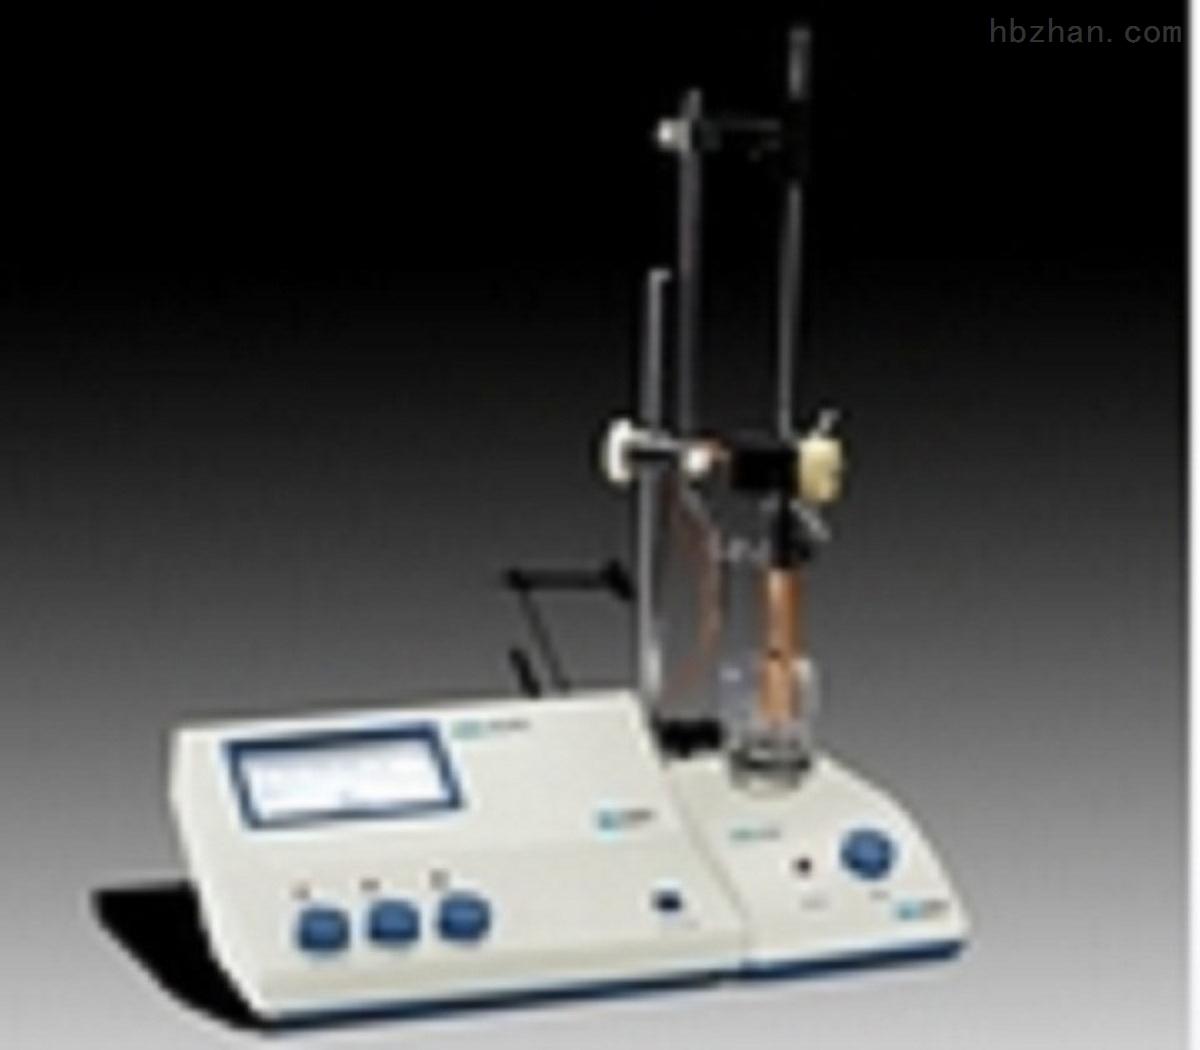 ZDY-501水份分析仪